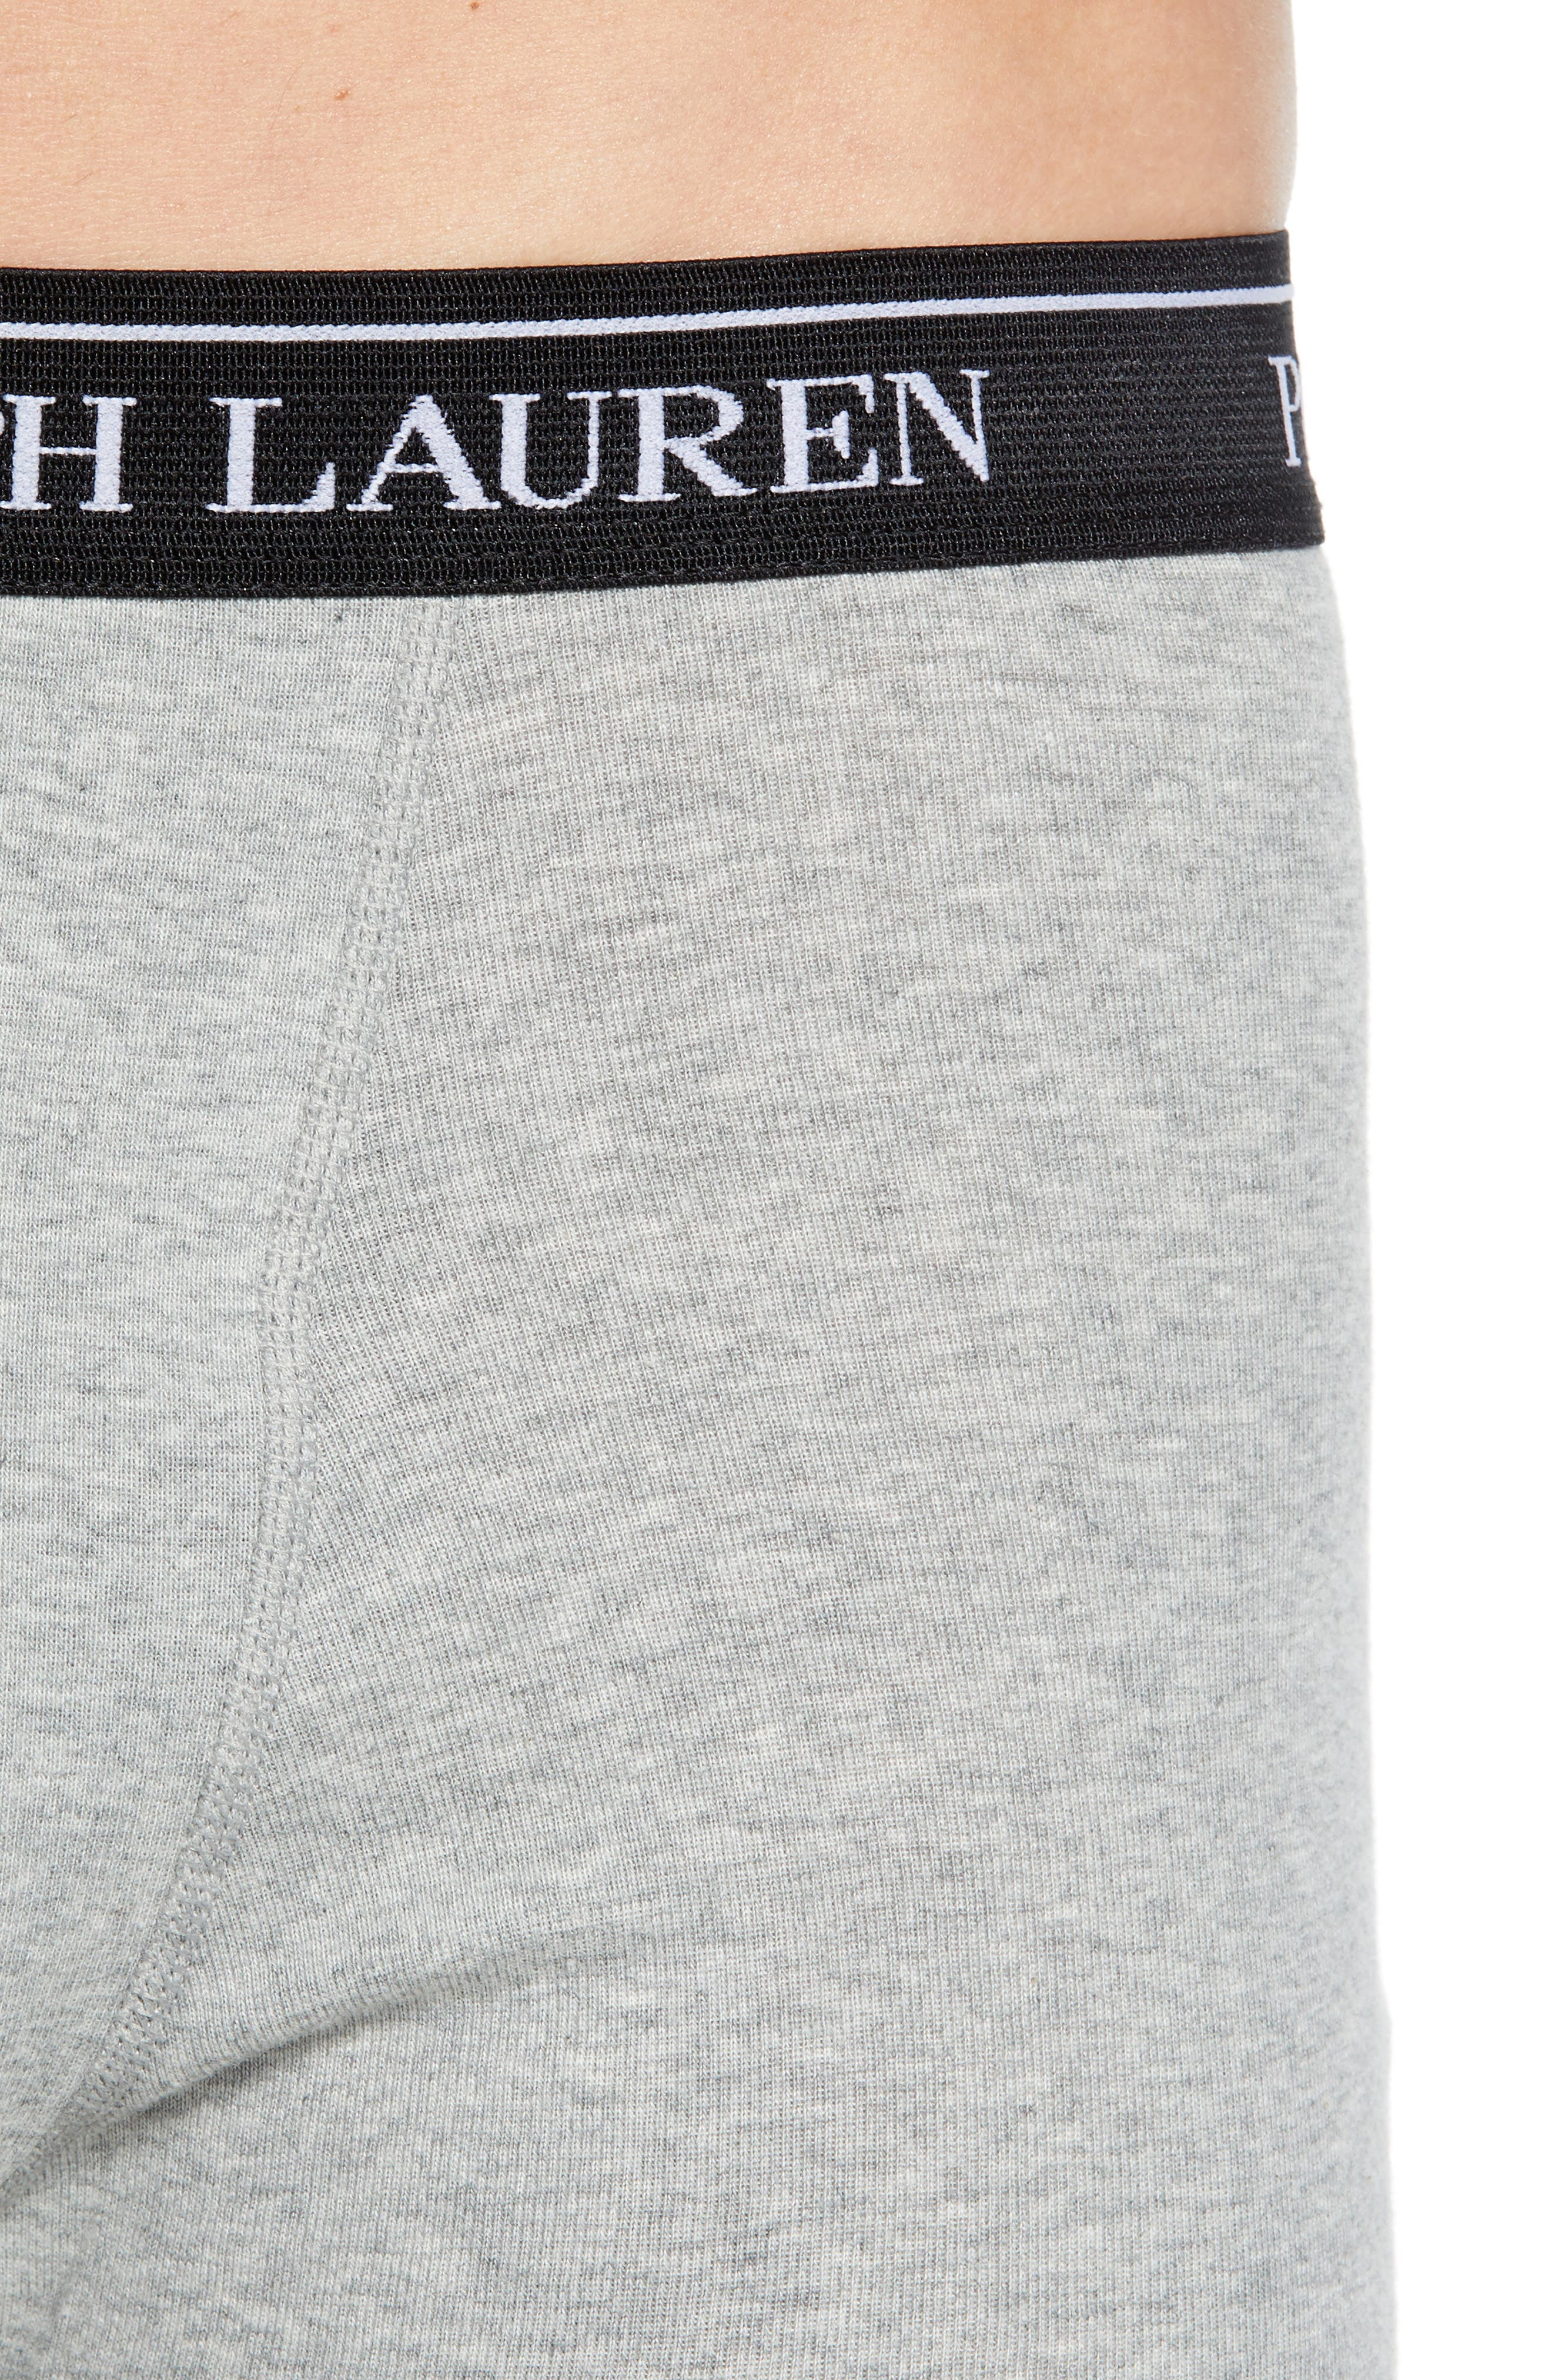 Polo Ralph Lauren 5-Pack Cotton Boxer Briefs,                             Alternate thumbnail 5, color,                             2ANDHTH/MA